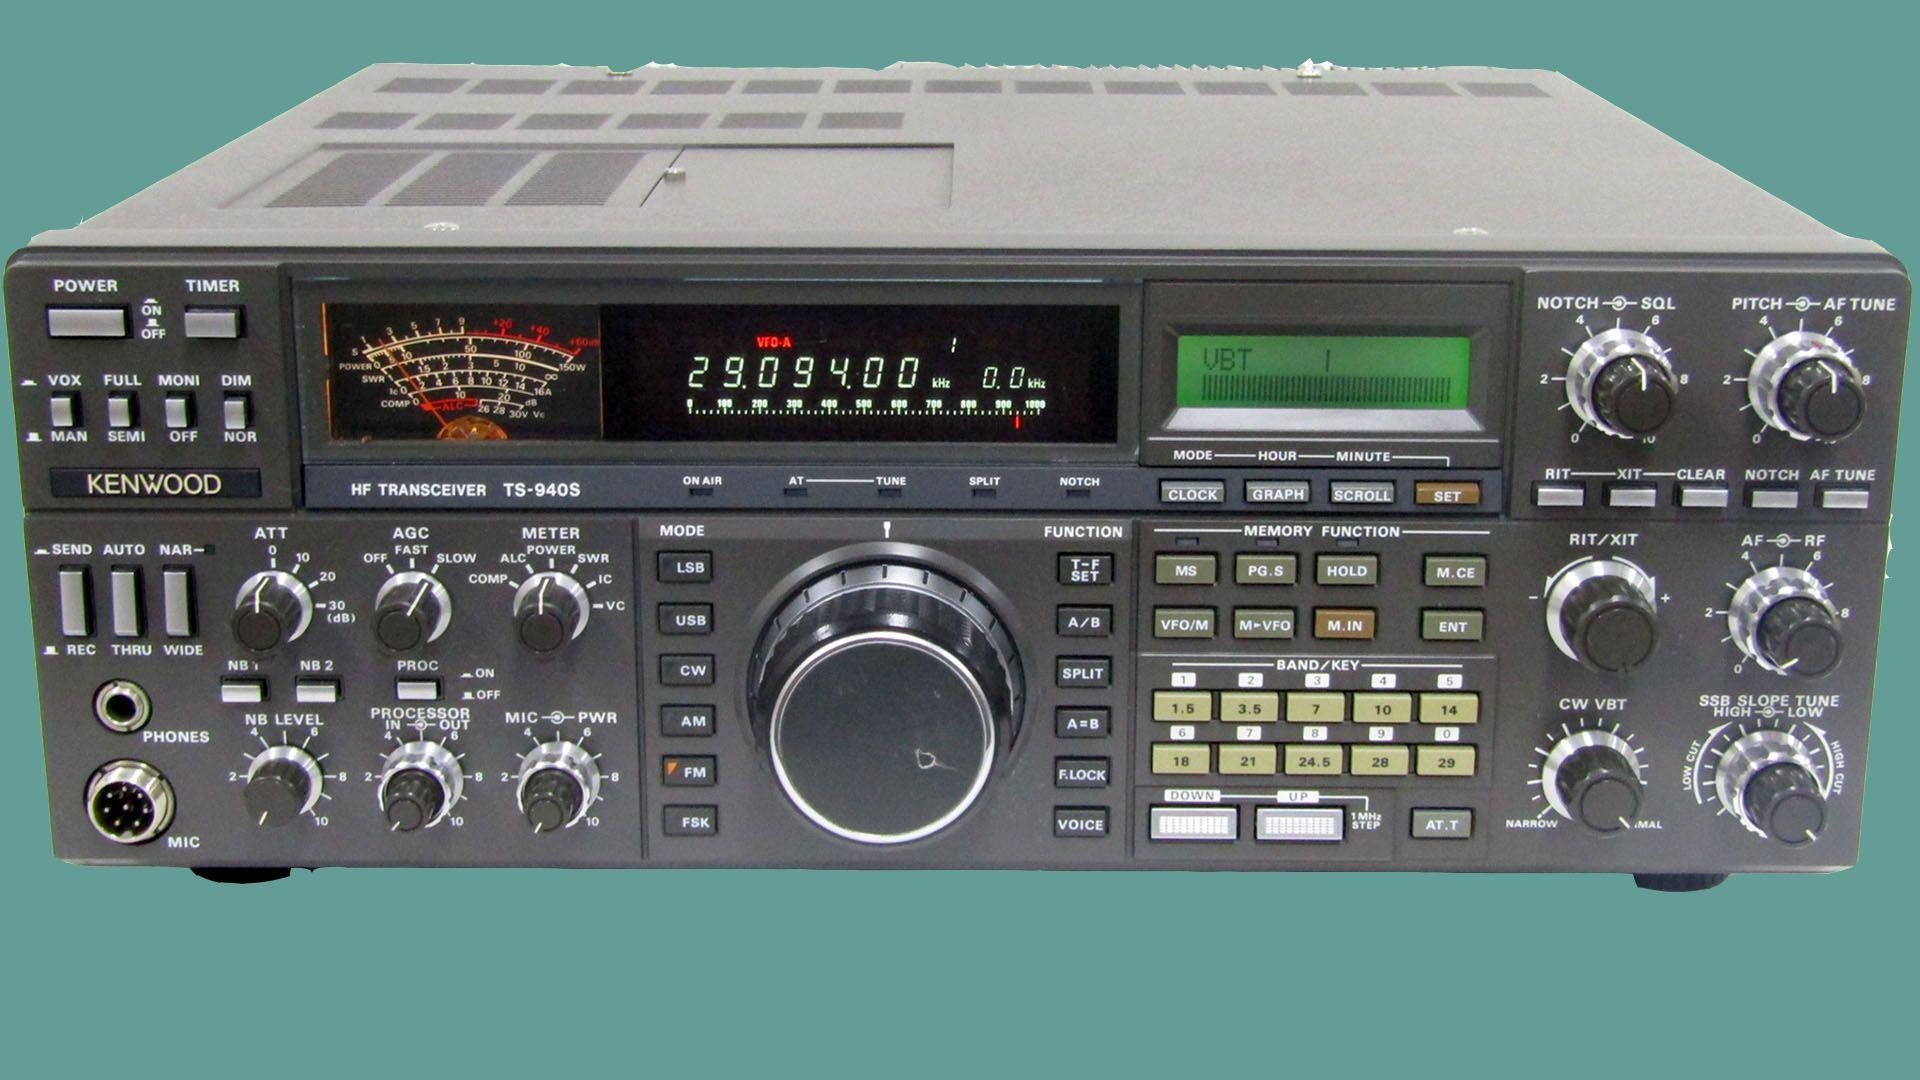 Kenwood TS-940S | Kenwood Radios | Kenwood radio, Ham radio, Ham